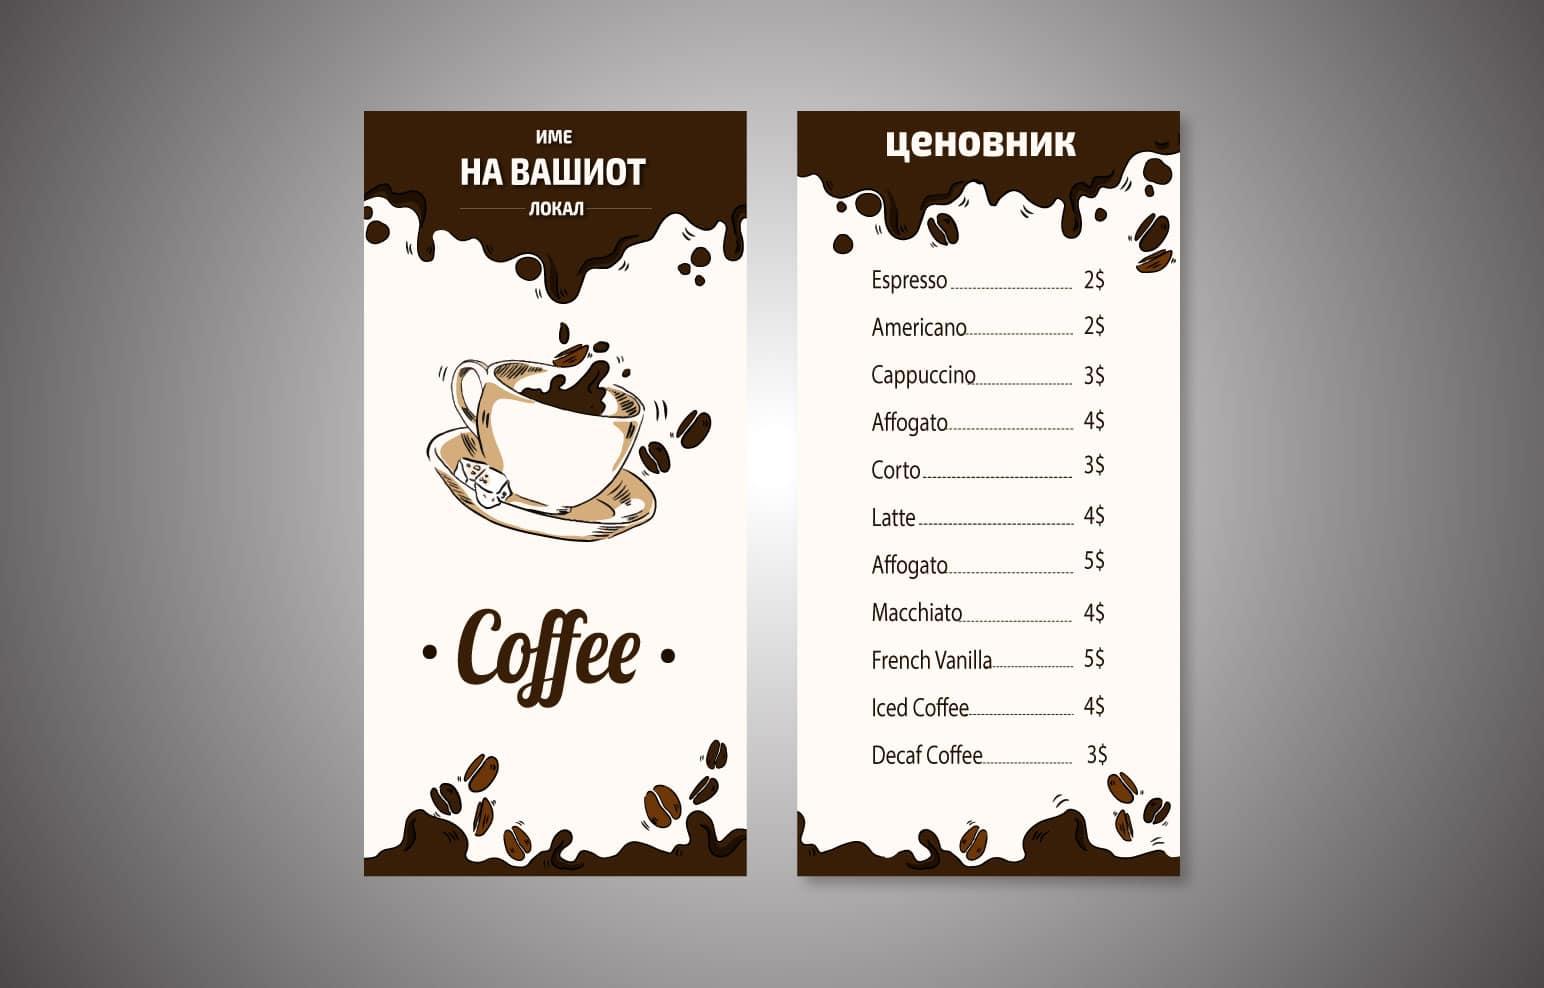 Ultra moderni cenovnici za kafe, Ултра модерни ценовници за кафе